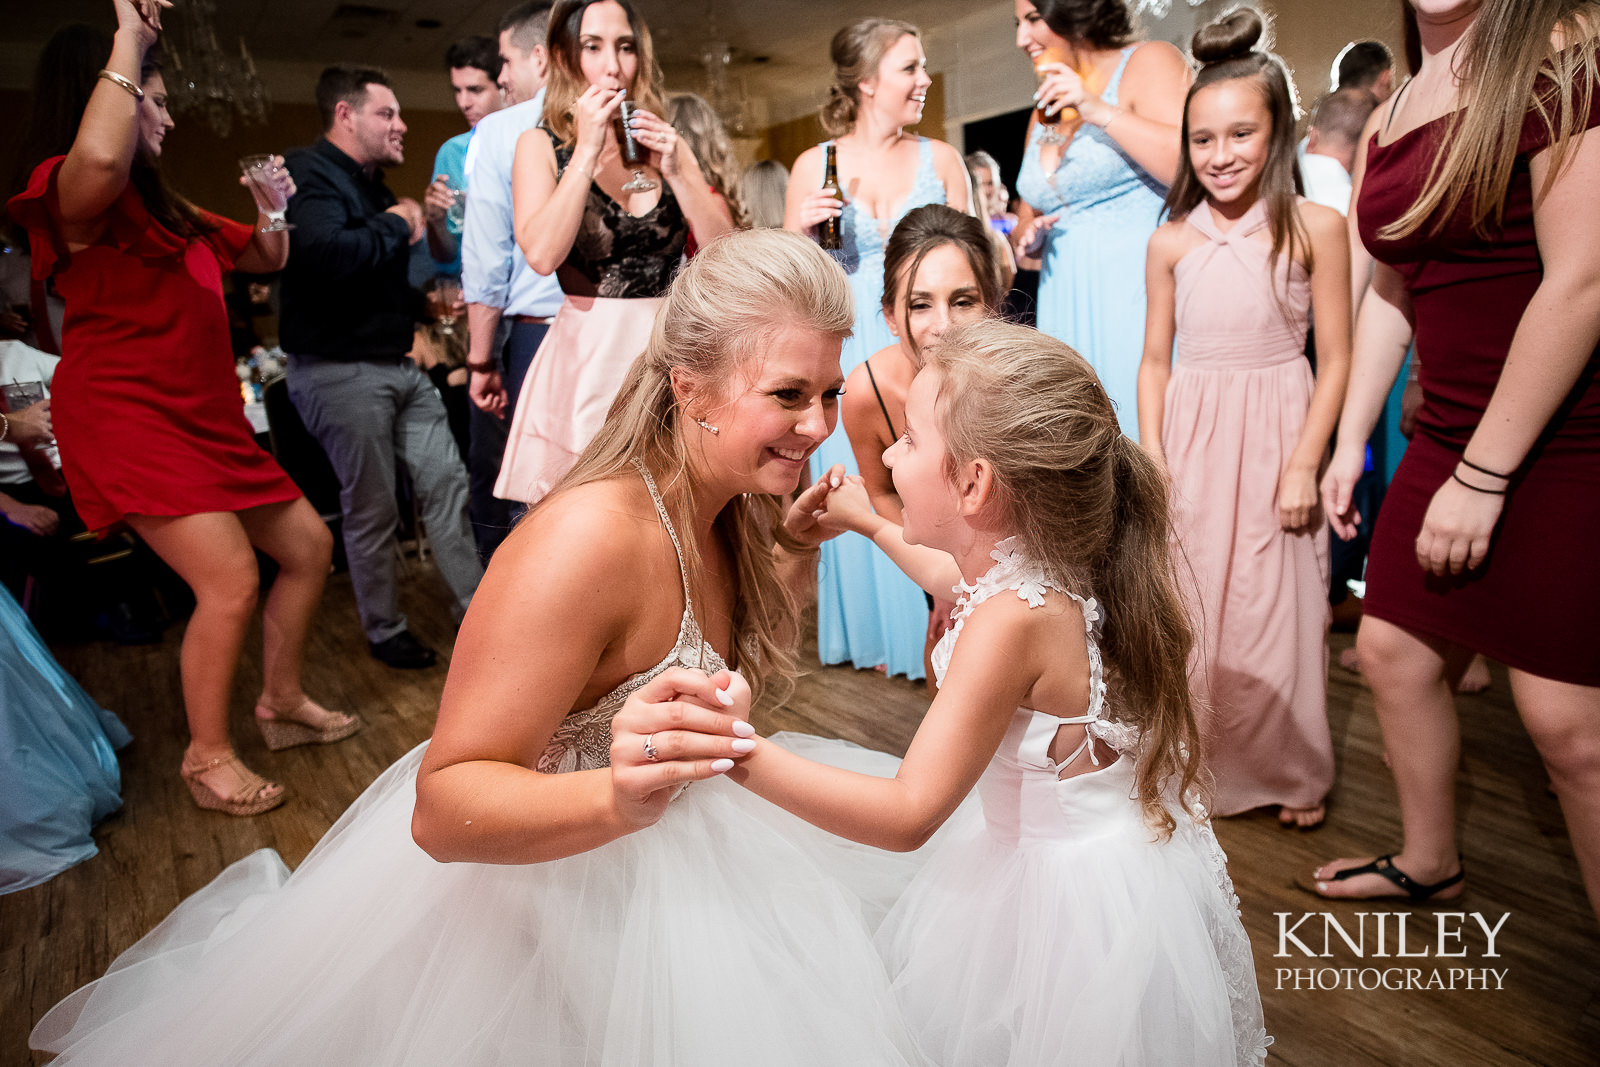 125 - Buffalo NY wedding pictures - Sean Patrick Restaurant Wedding Reception - Getzville - XT2A8111.jpg